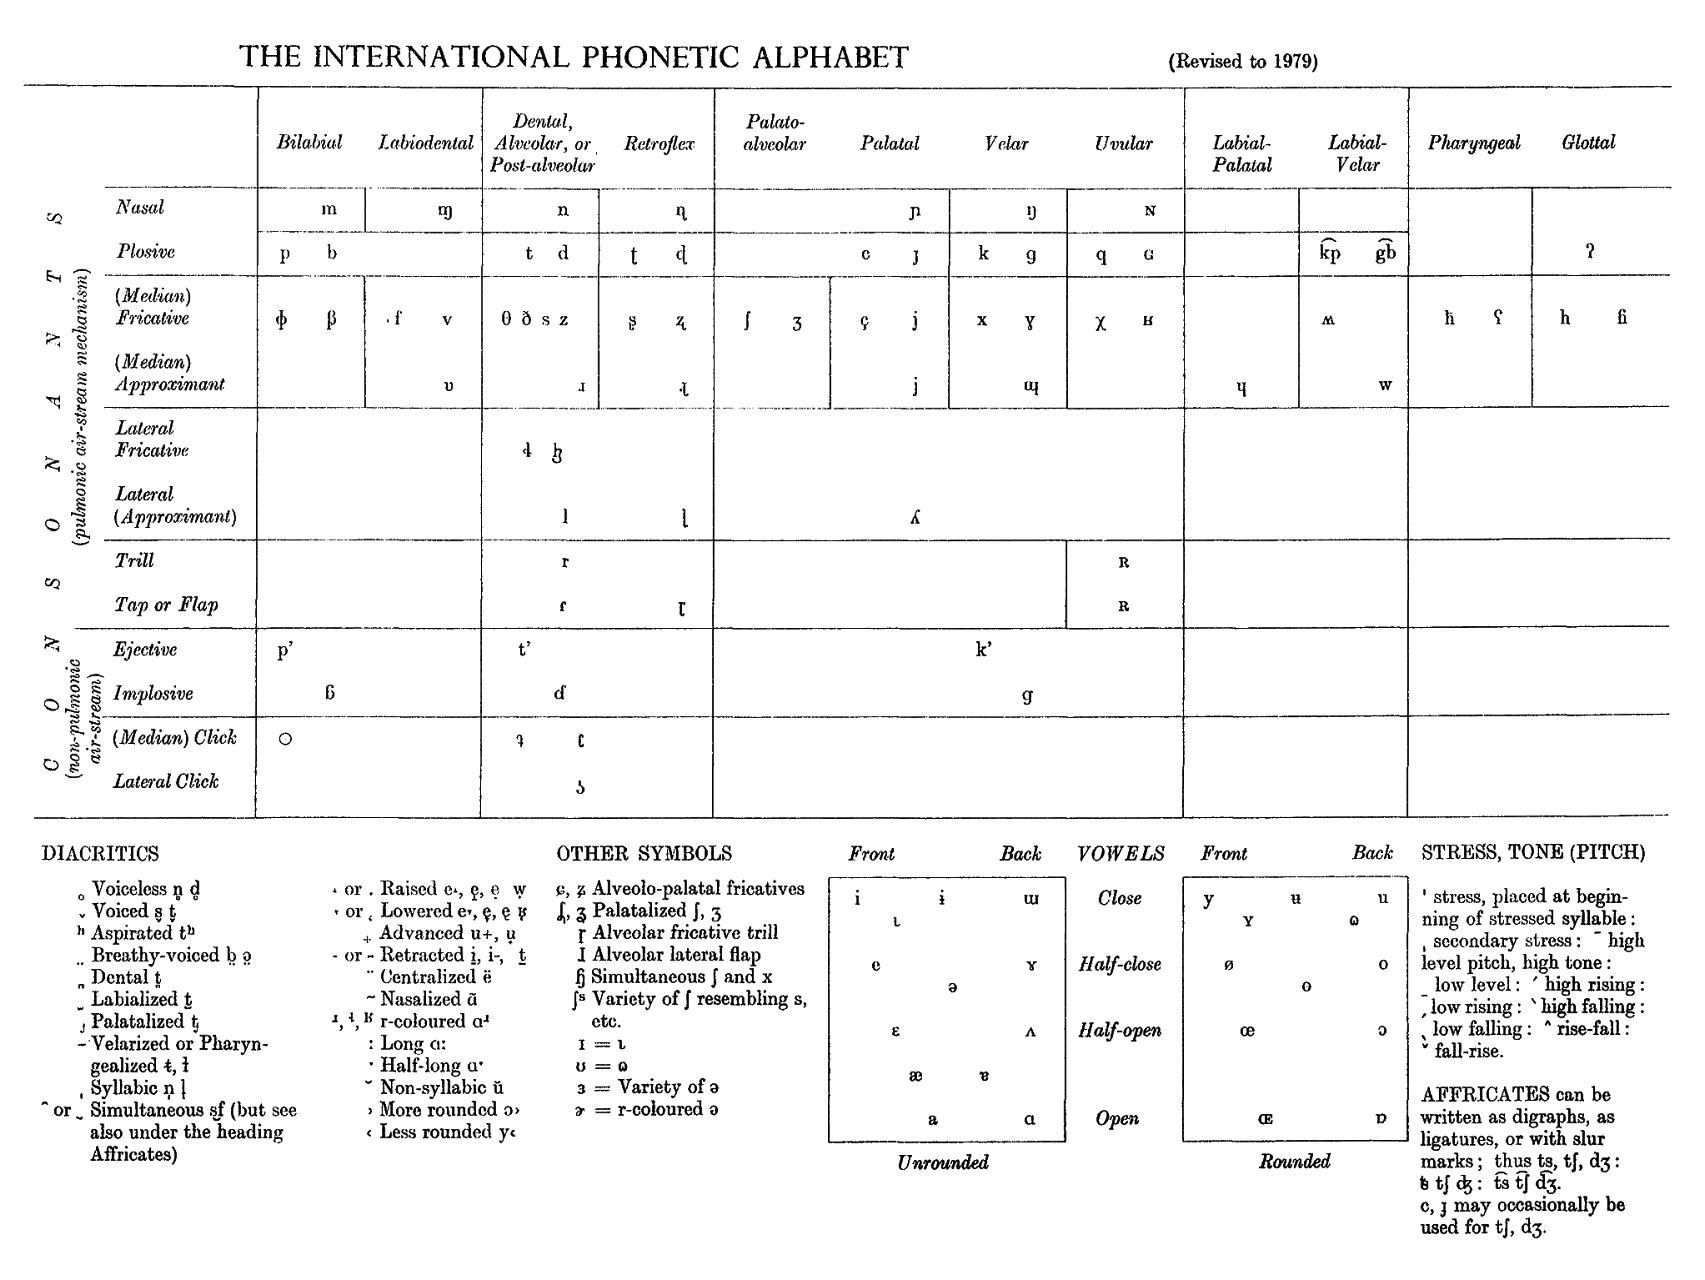 java international phonetic alphebat dictionary